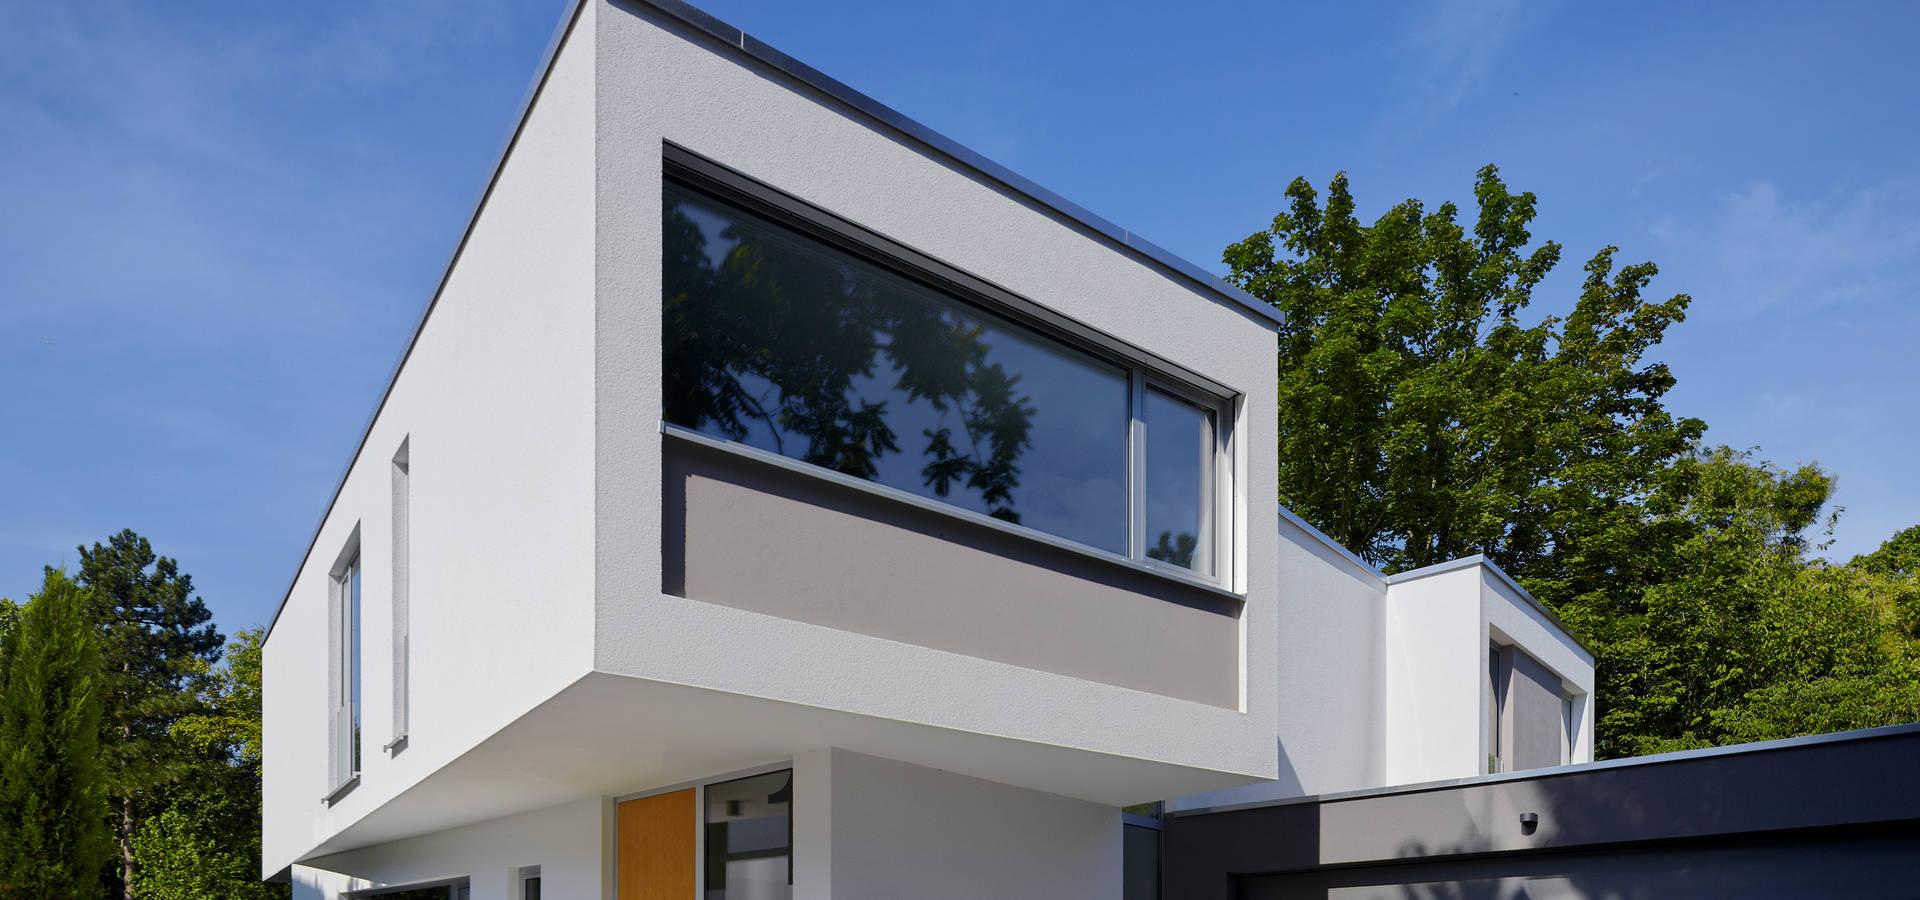 marcus hofbauer architekt arquitectos em mainz homify. Black Bedroom Furniture Sets. Home Design Ideas